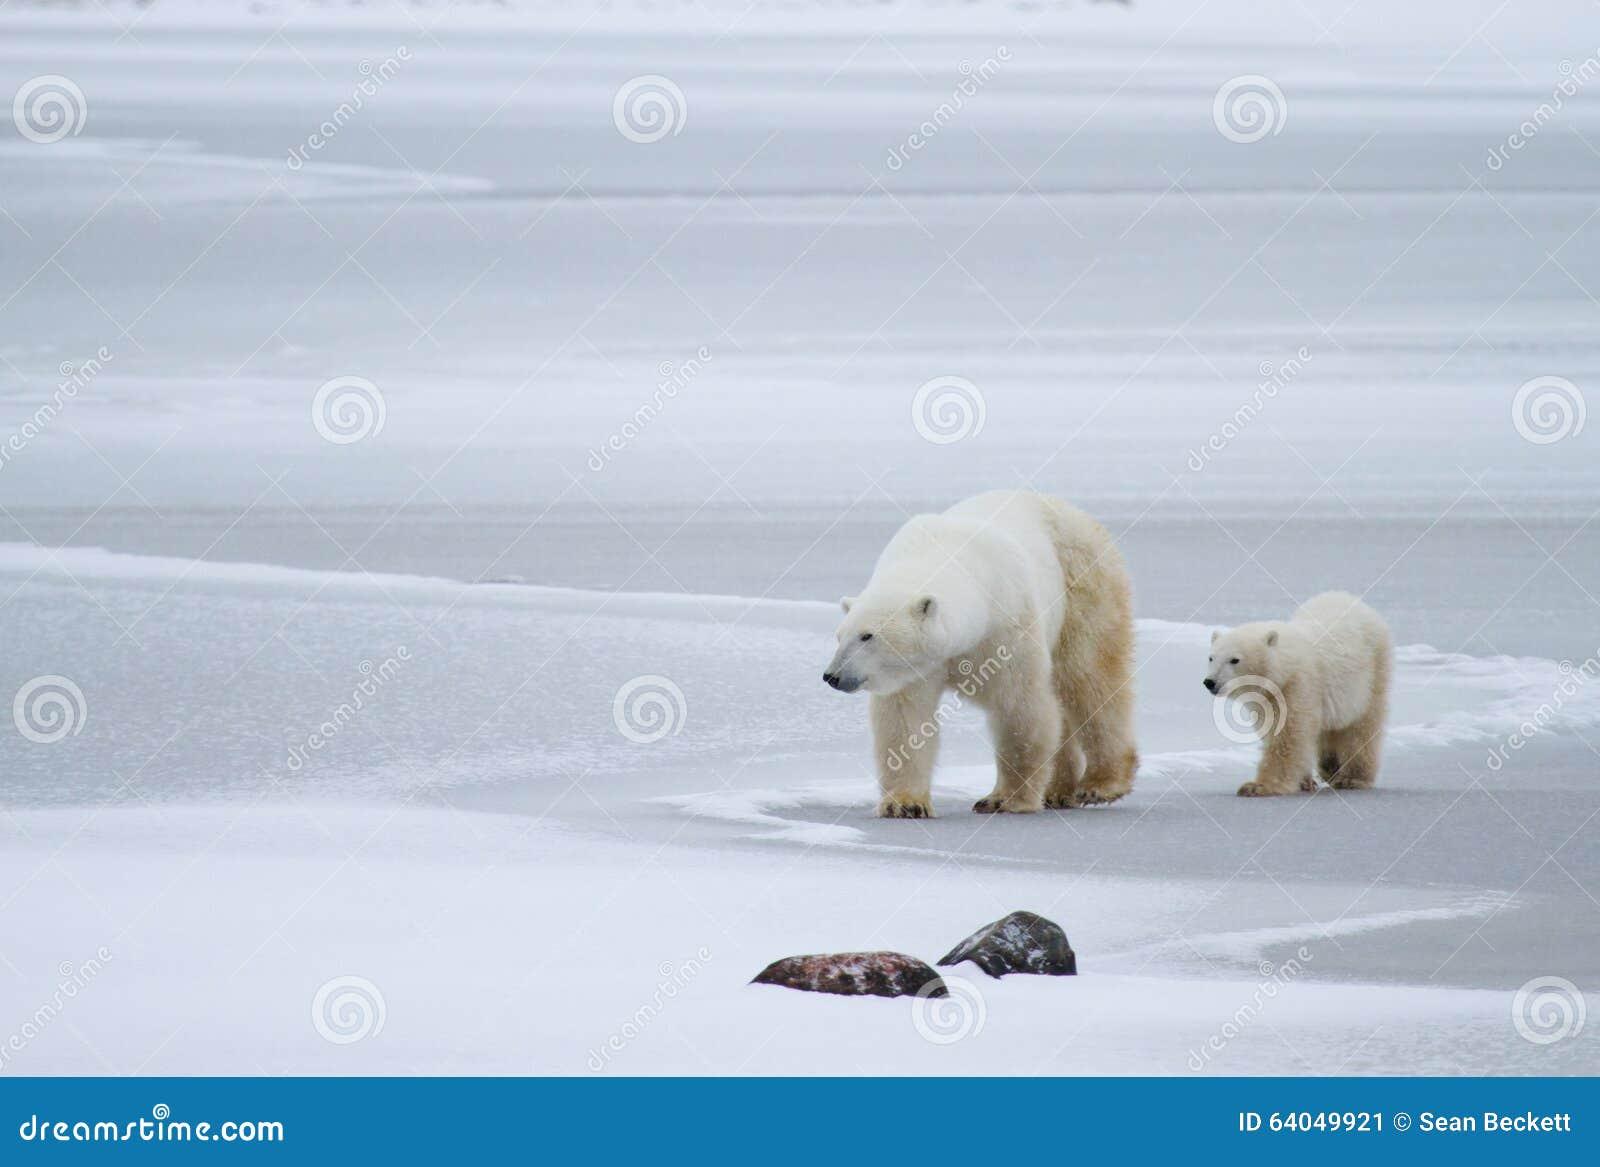 Polar Bear Mom And Cub On Ice Stock Photo - Image: 64049921